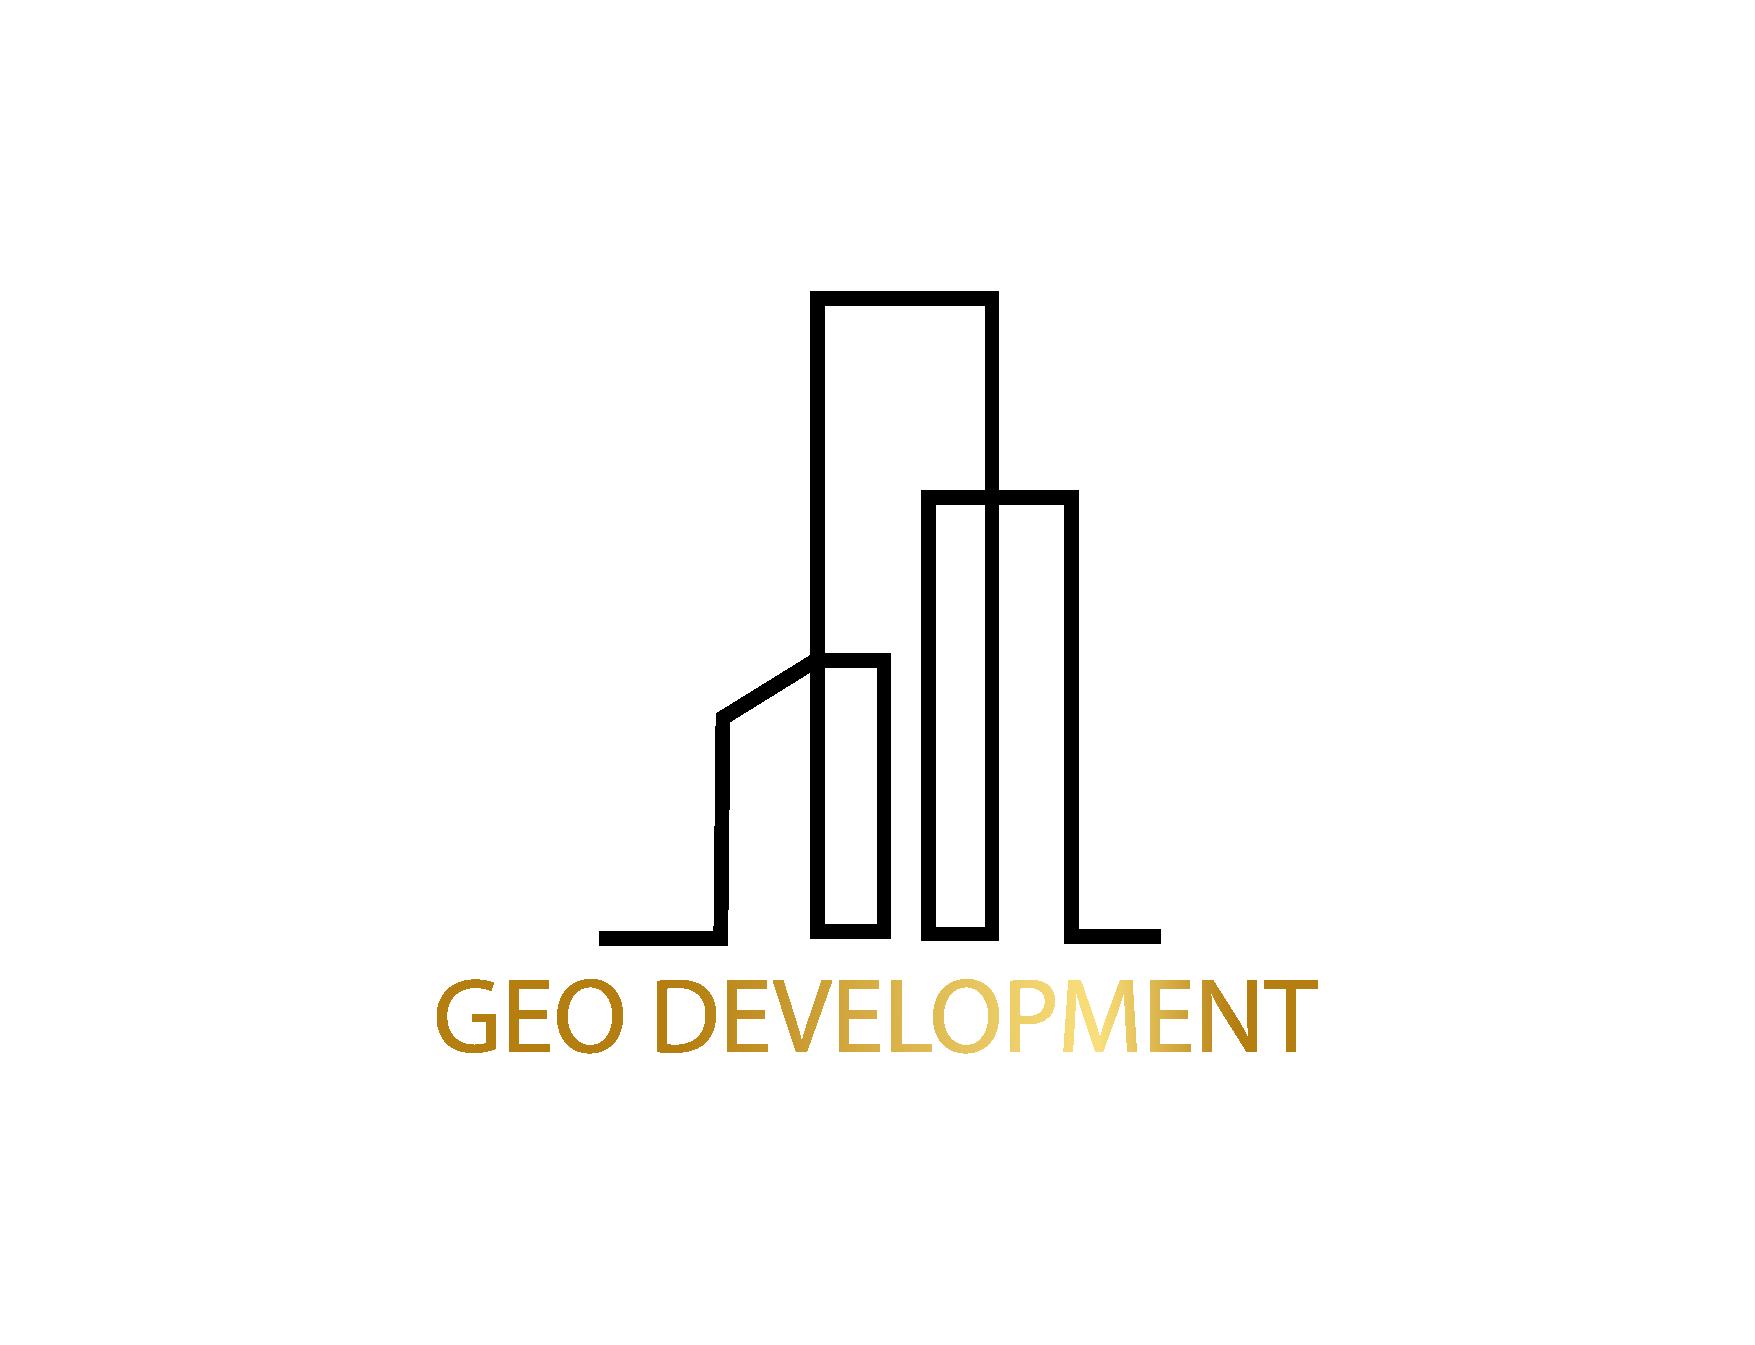 Geo development